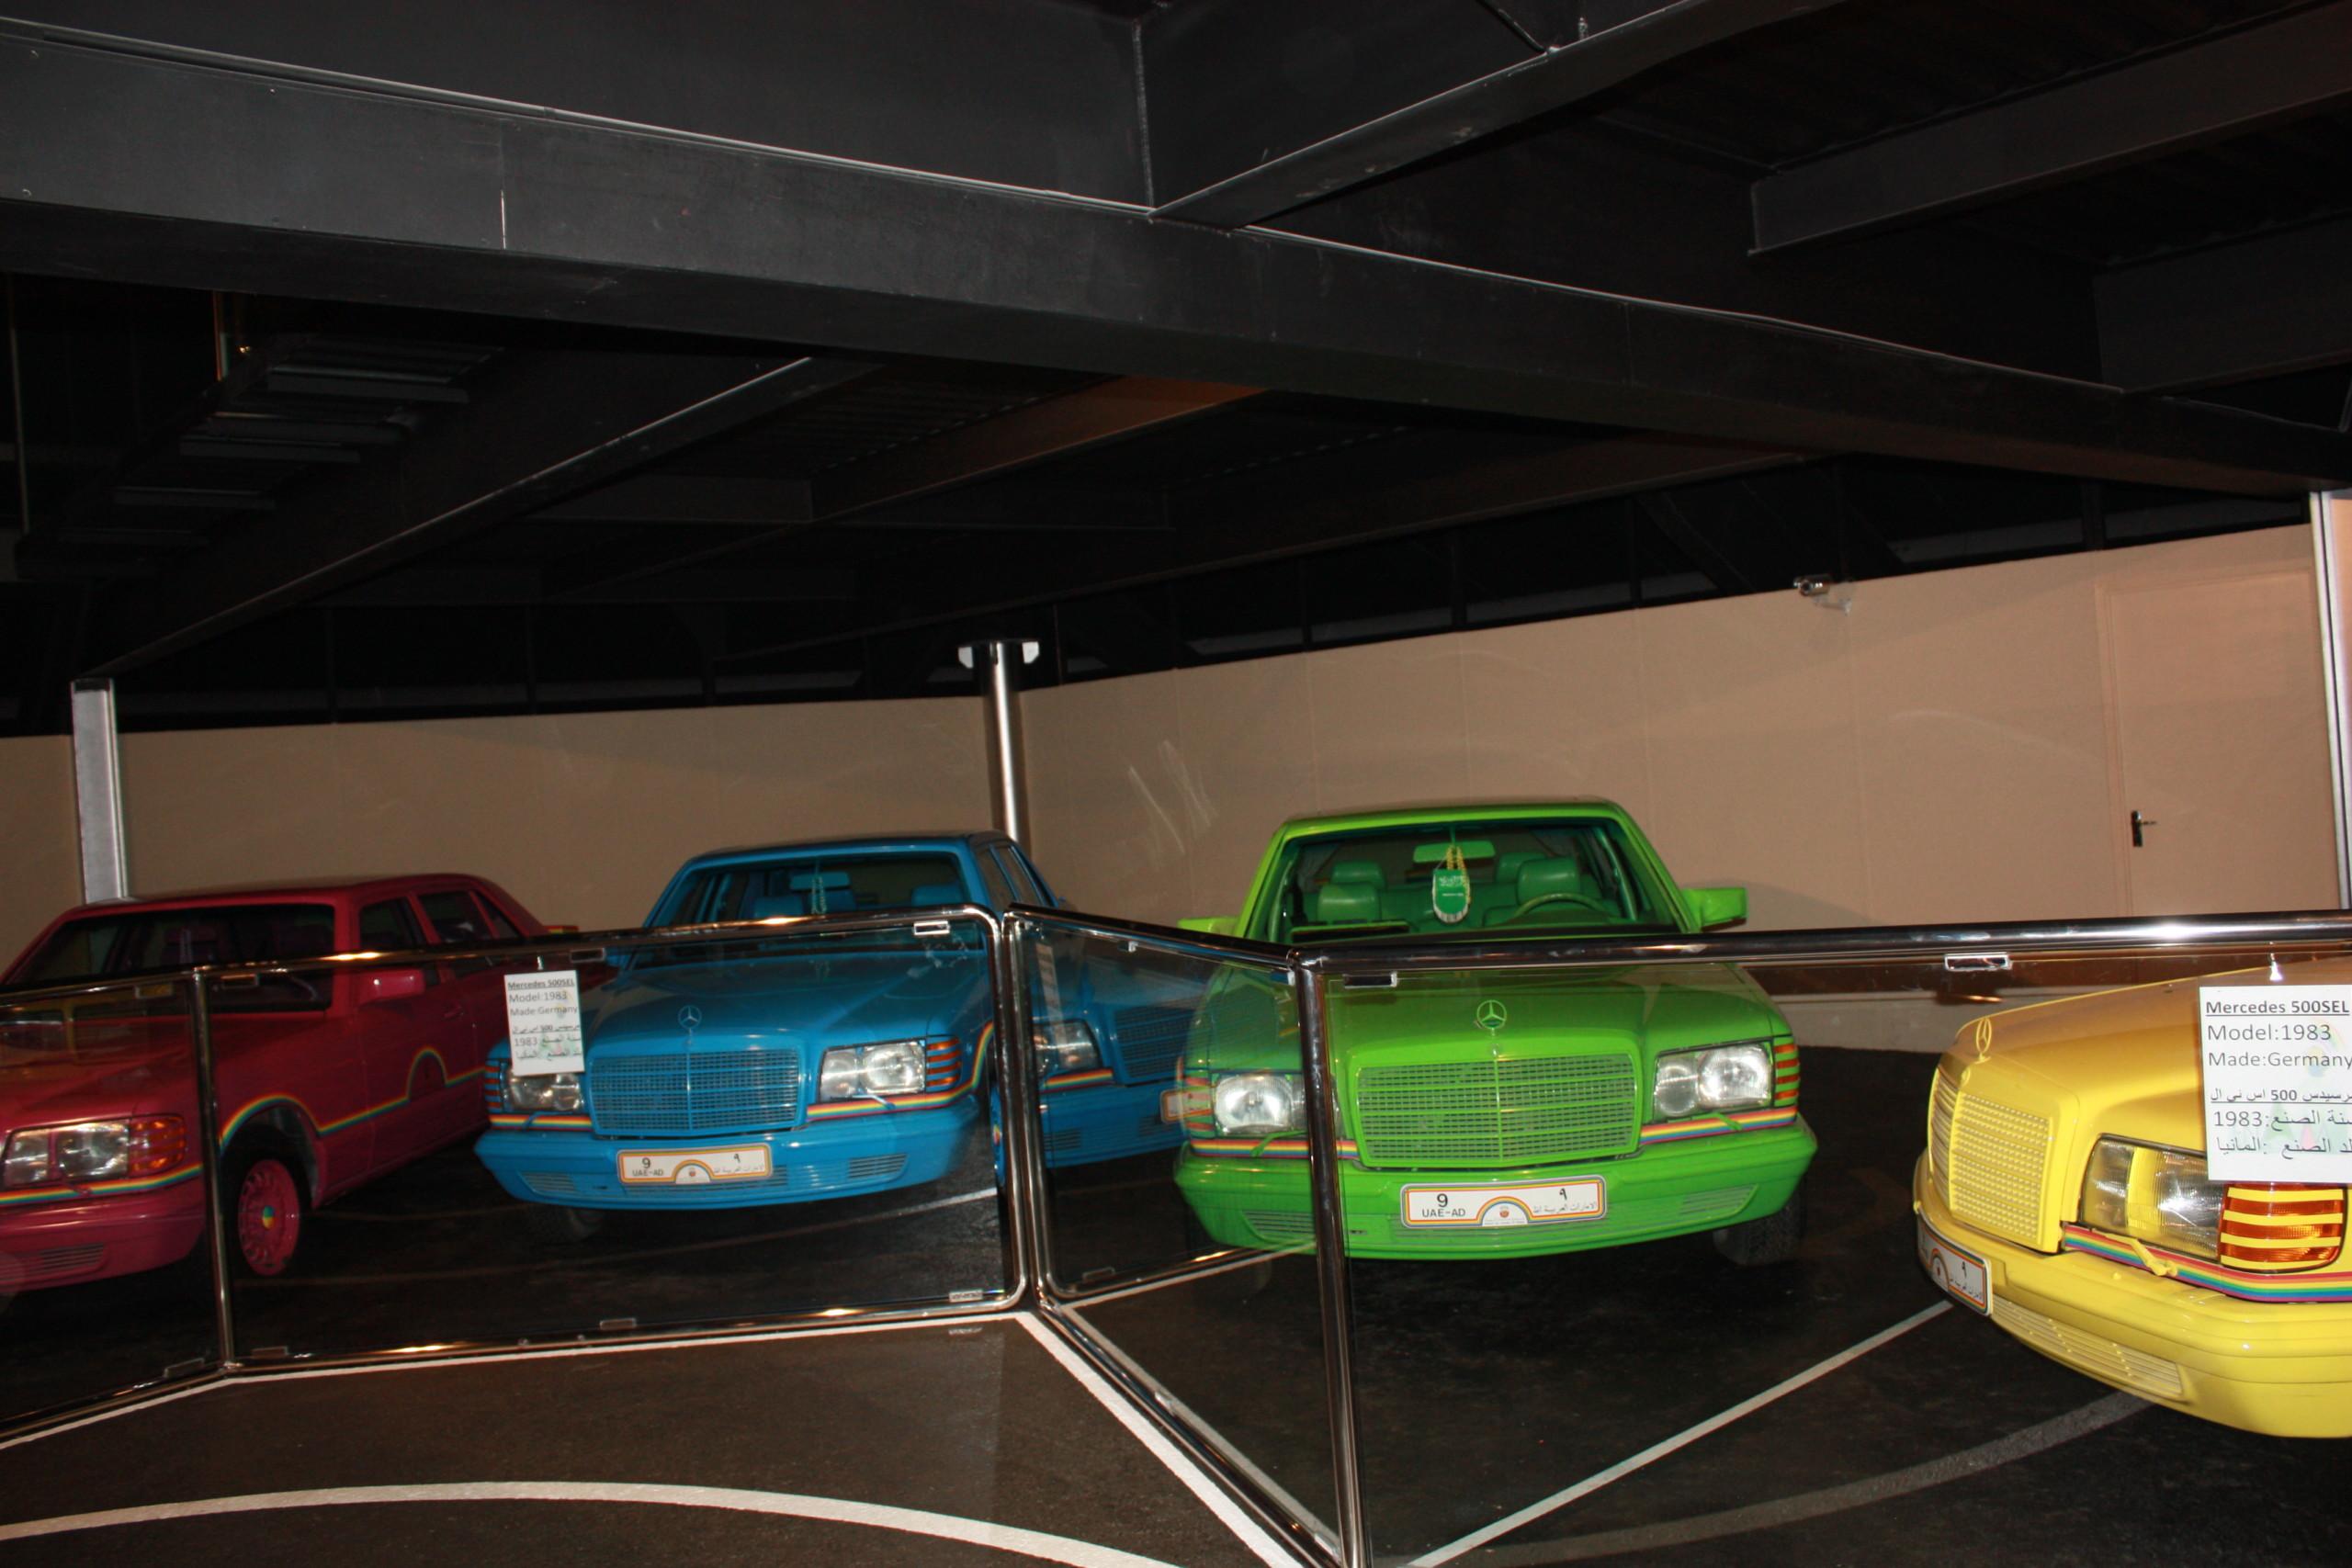 (V/W126): As exóticas Classe S do Sheik Hamad Bin Hamdan Al-Nahyan - SGS Styling Garage Hamburg® A2a25a10